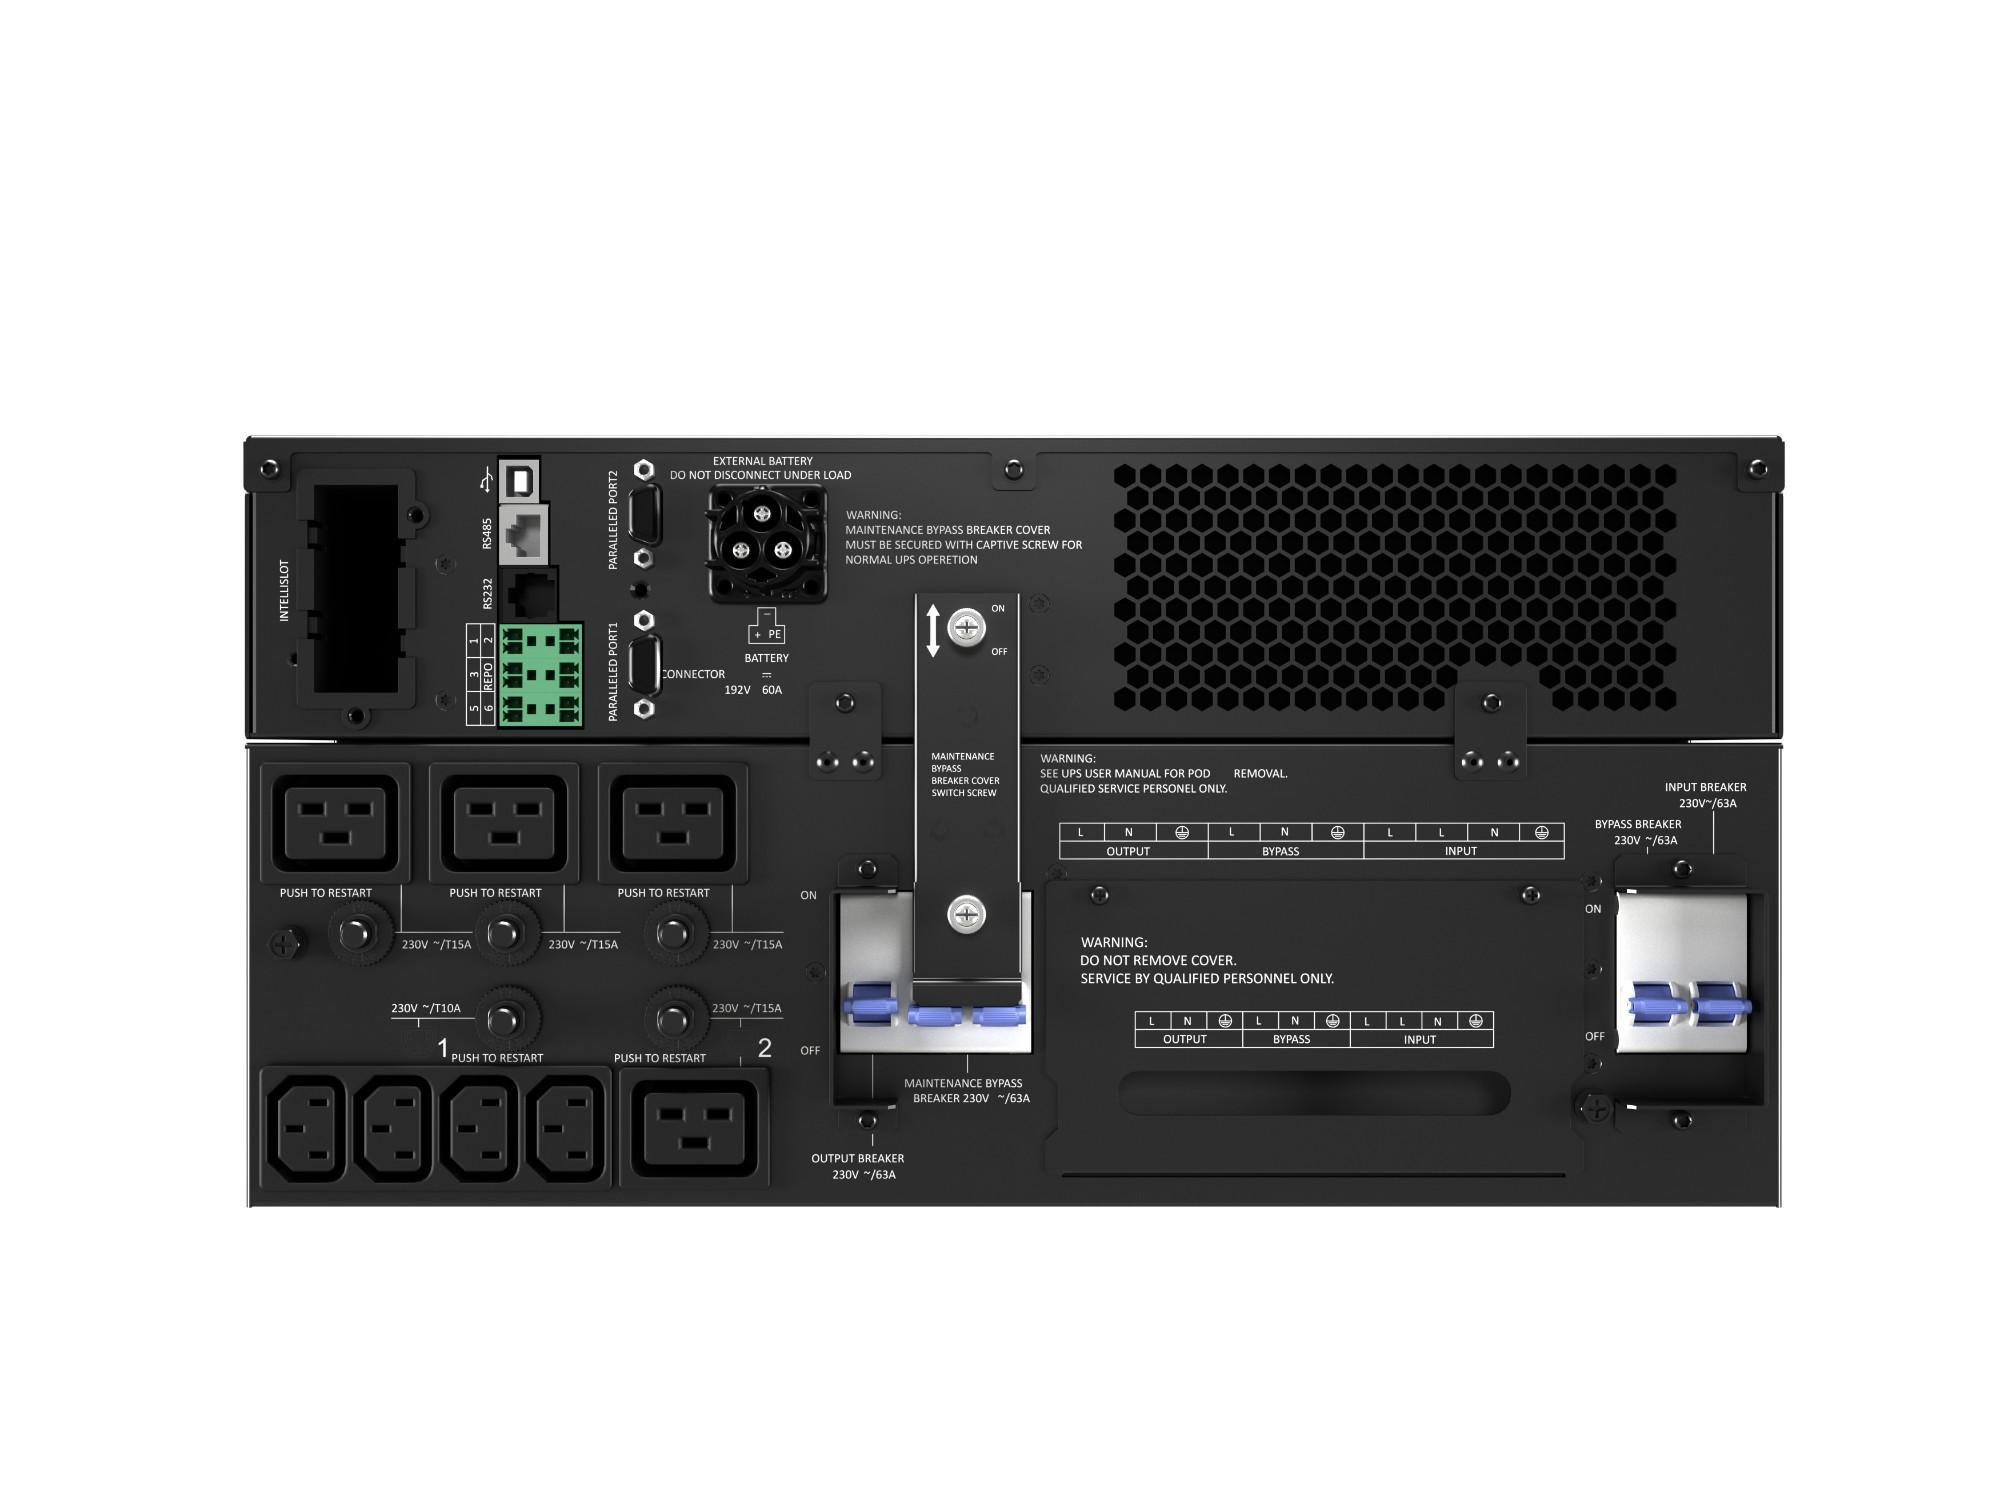 Vertiv Liebert GXT5-8000IRT5UXLE sistema de alimentación ininterrumpida (UPS) Doble conversión (en línea) 8000 VA 8000 W 8 salidas AC